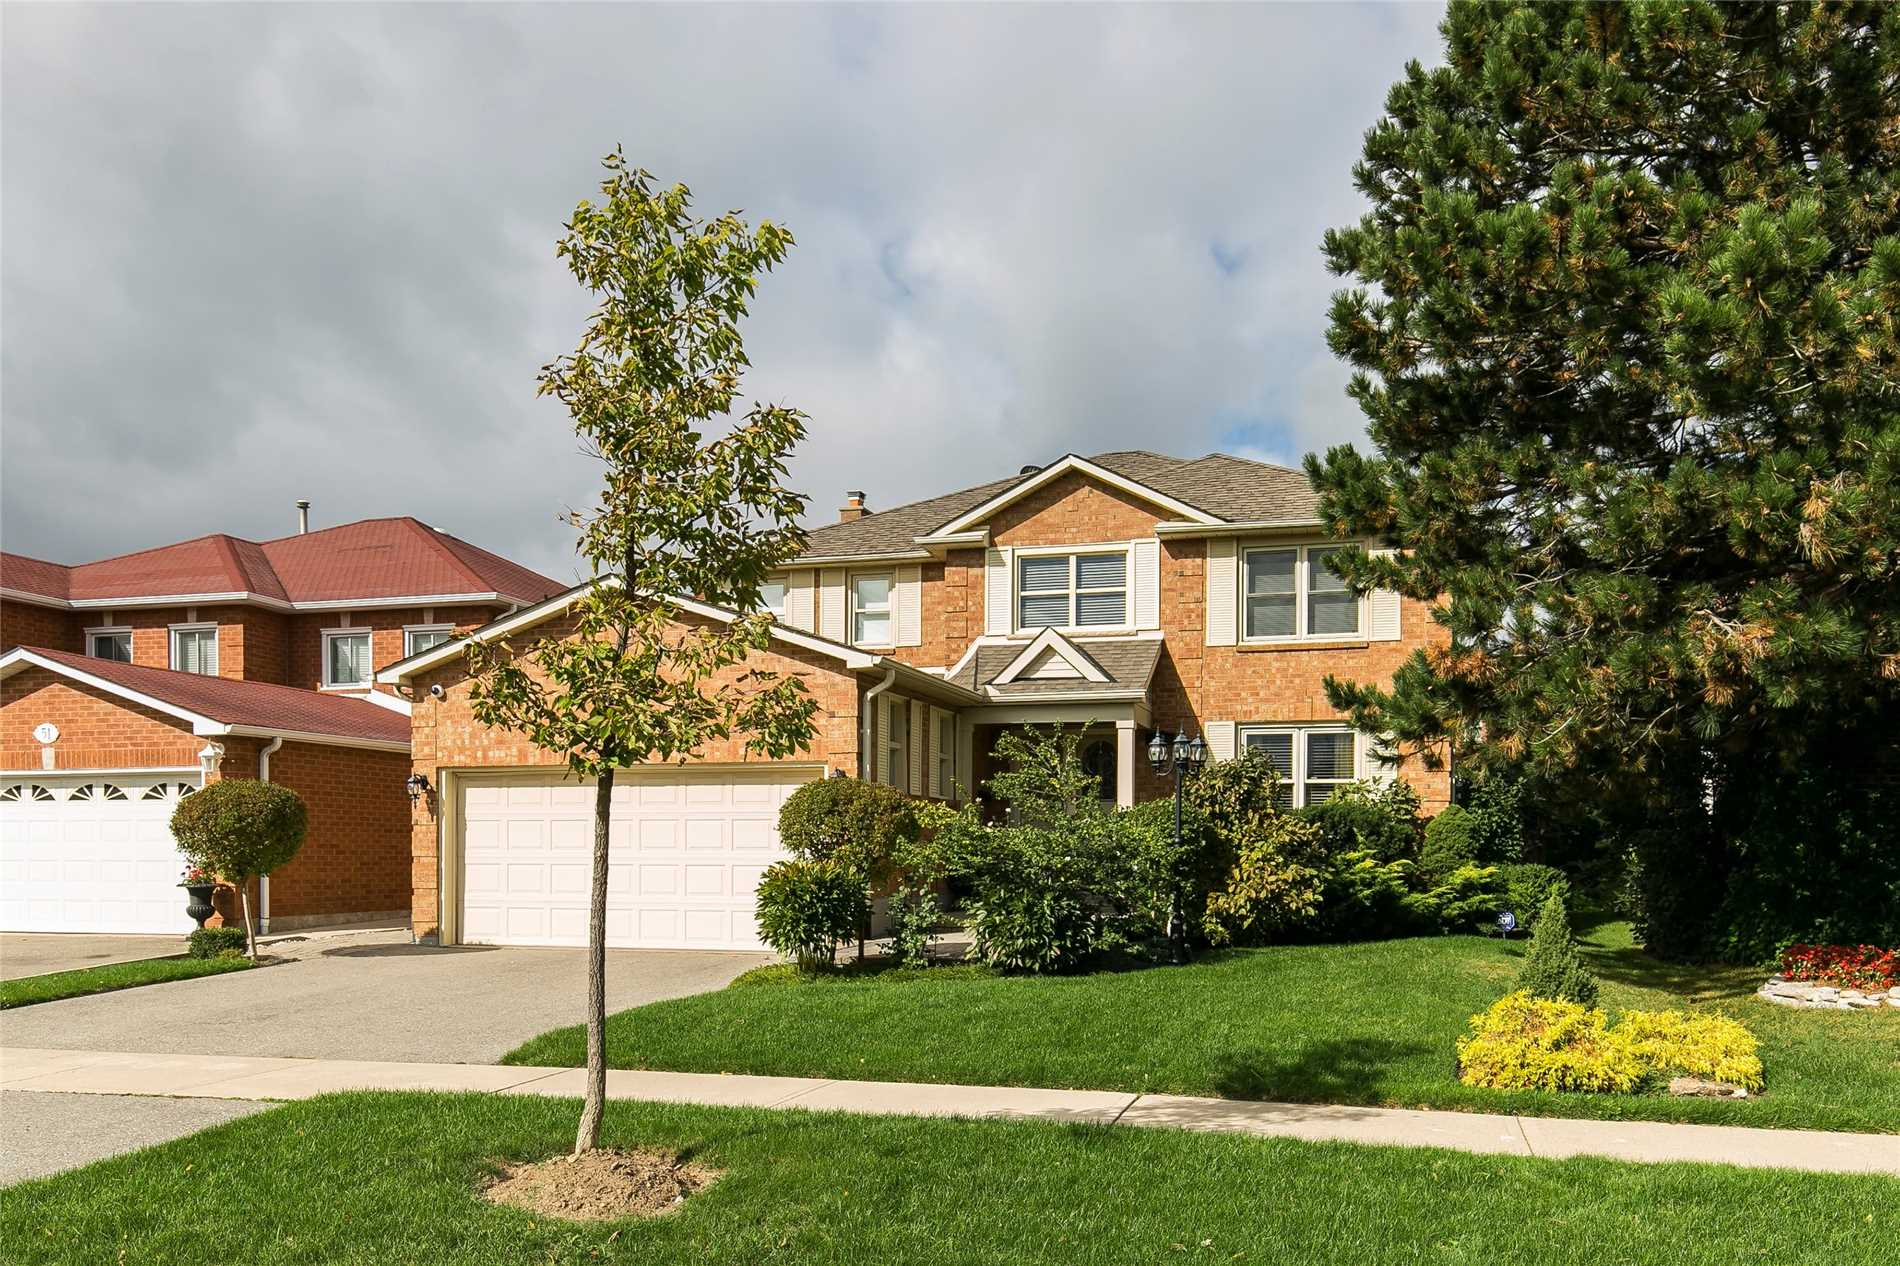 House for sale at 53 Corkett Drive Brampton Ontario - MLS: W4314527